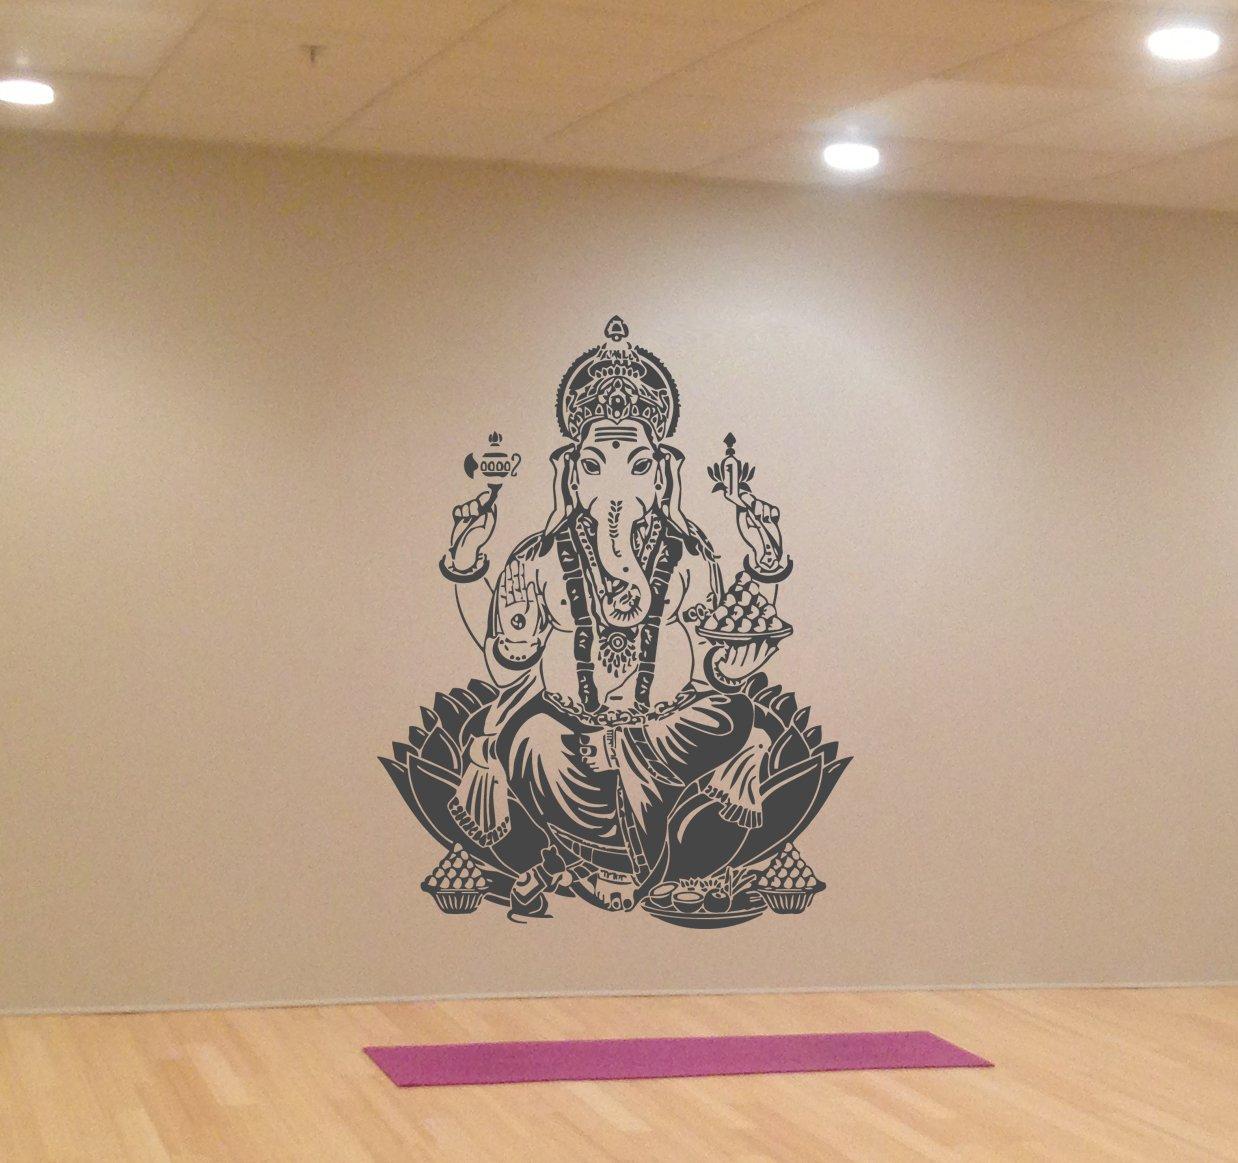 Ik417 Wall Decal Sticker Room Decor Wall Art Mural - Yoga And Indian God - HD Wallpaper